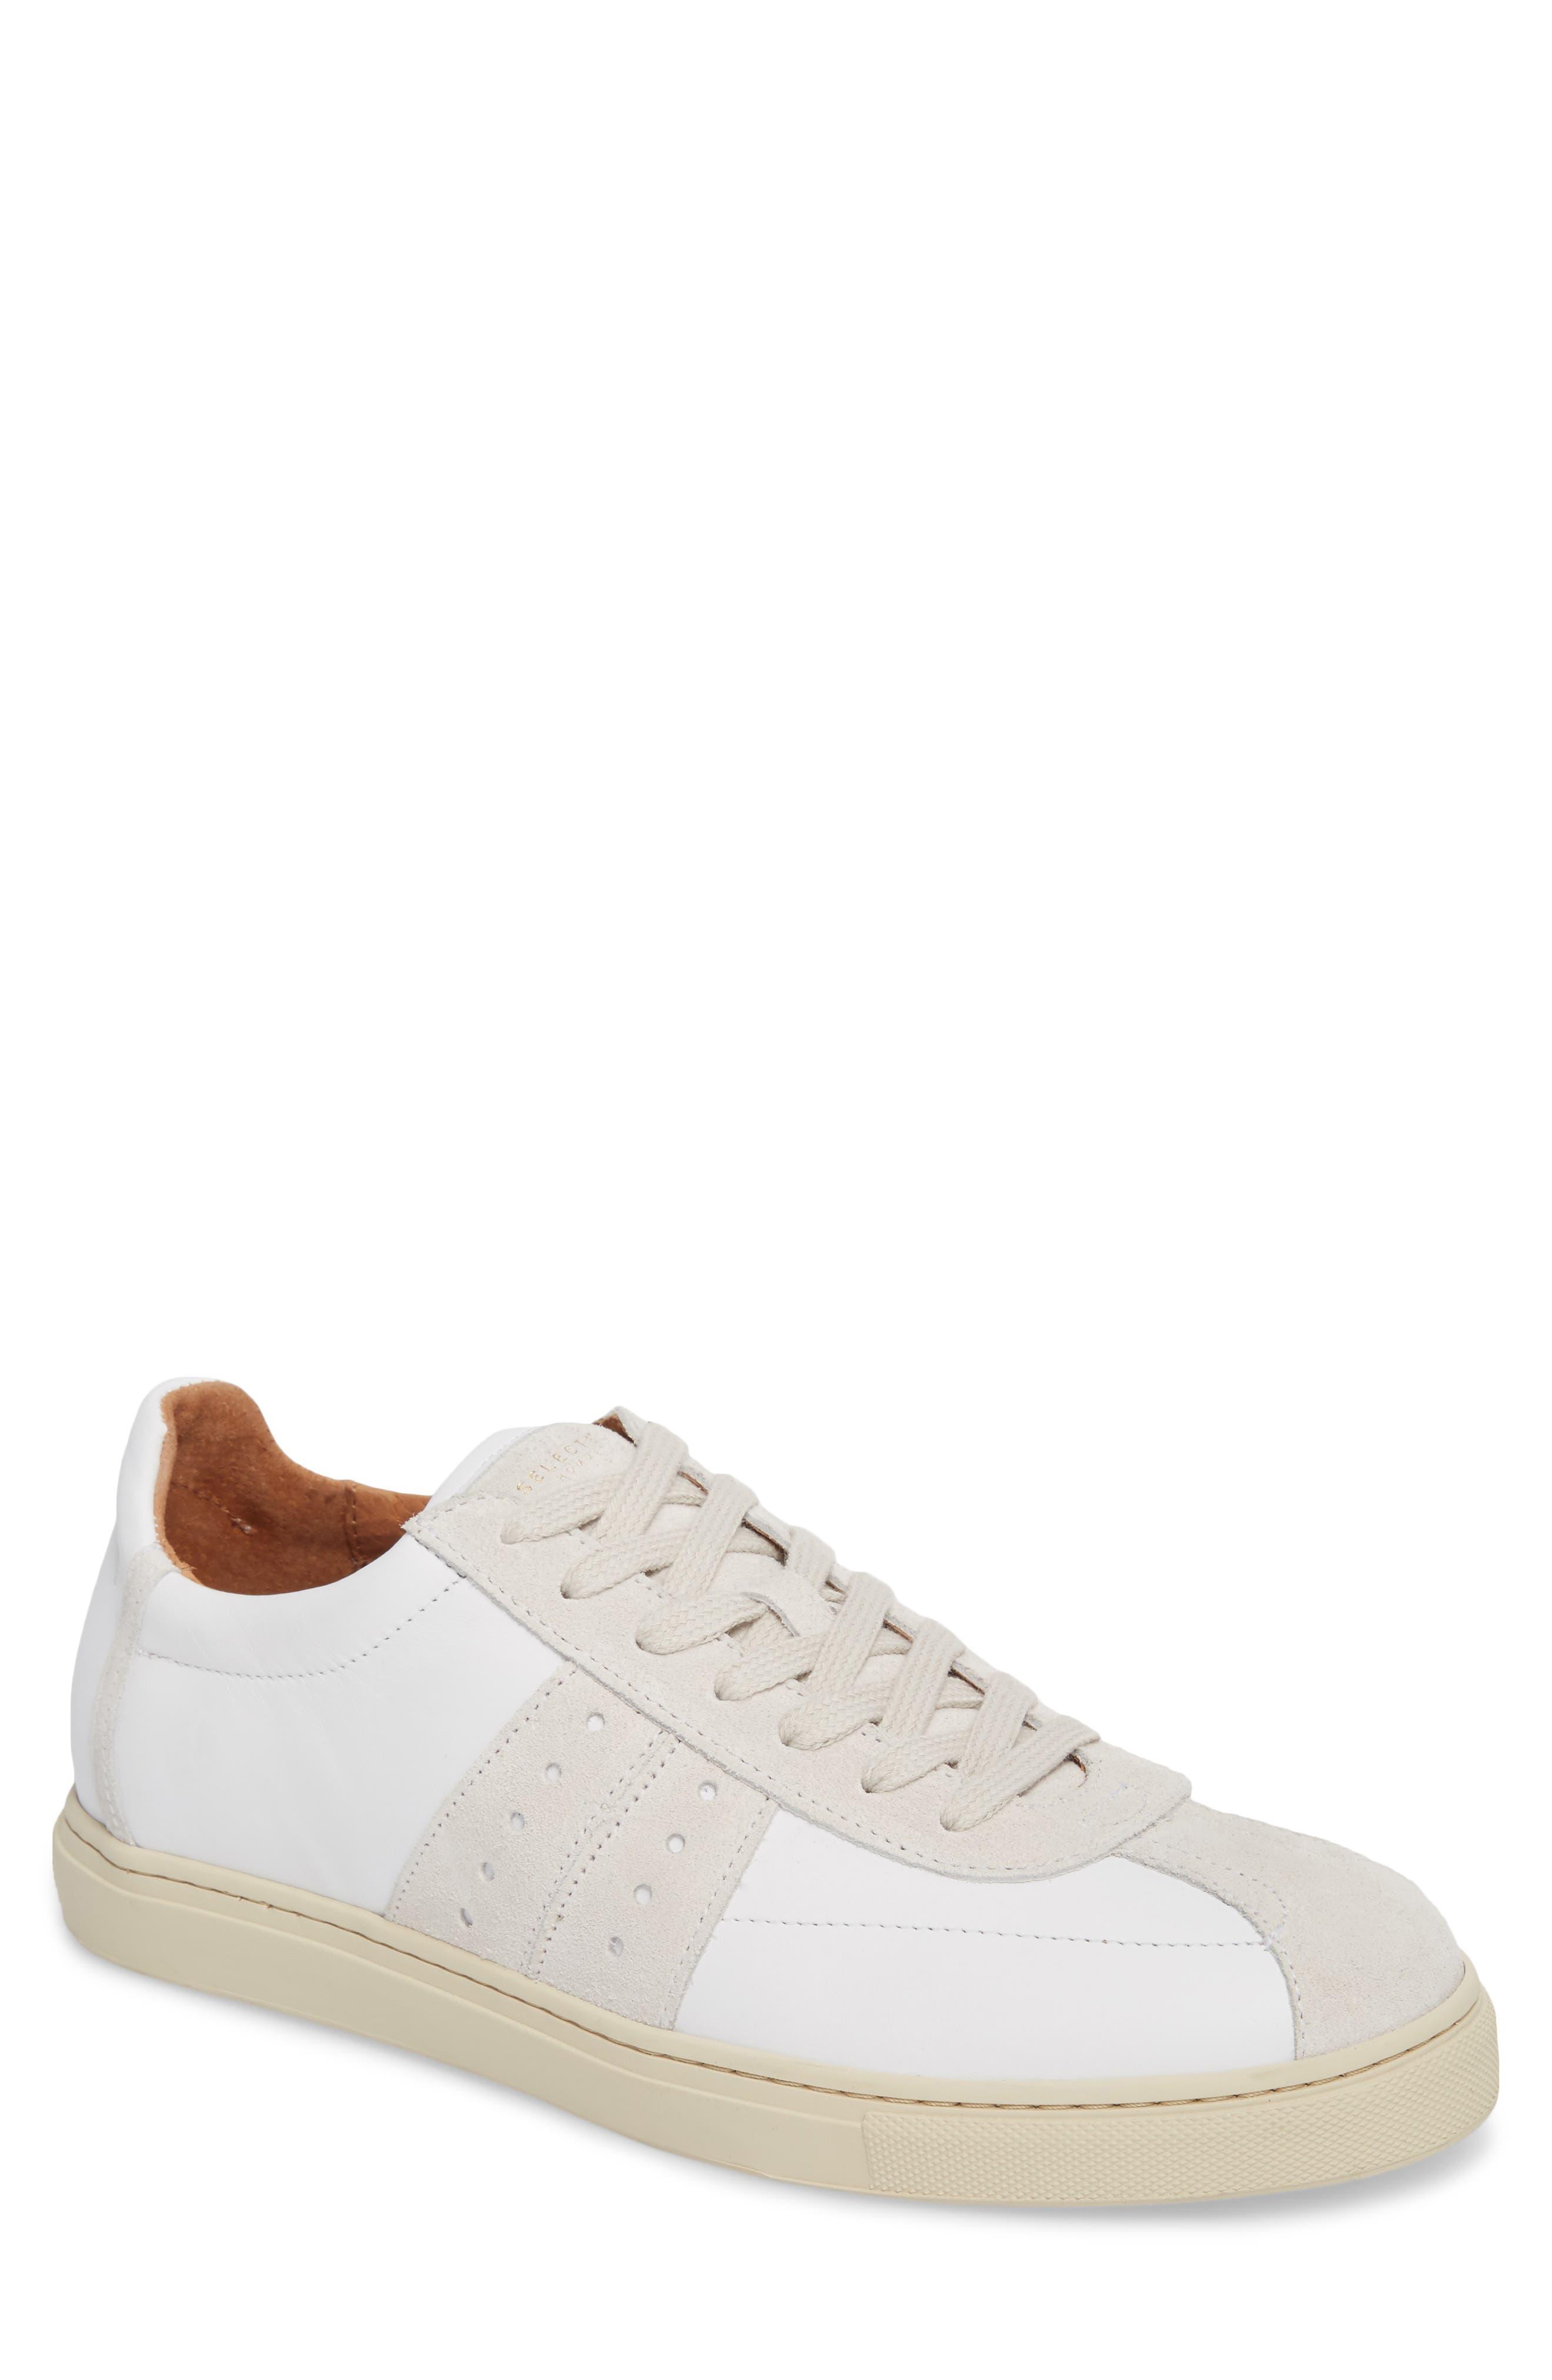 Duran New Mix Sneaker,                         Main,                         color, 100